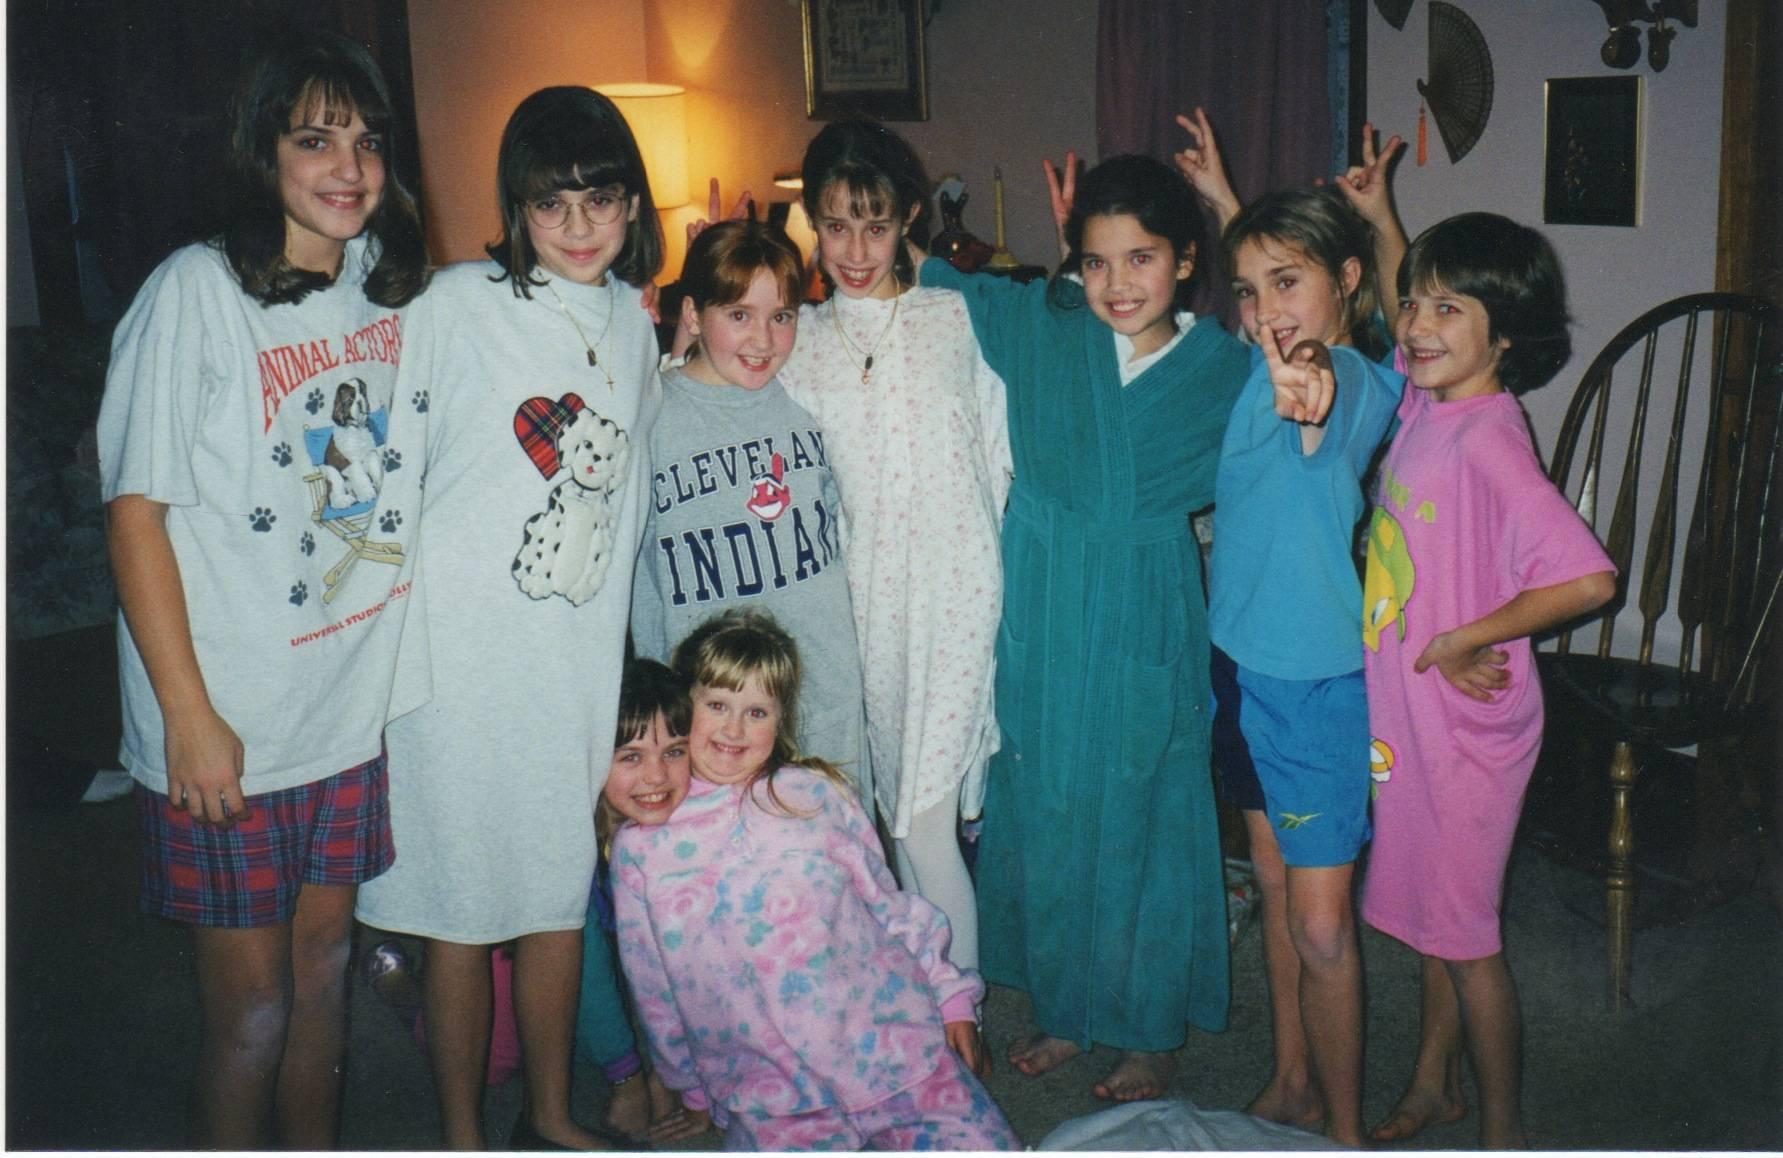 The praise dance little girls